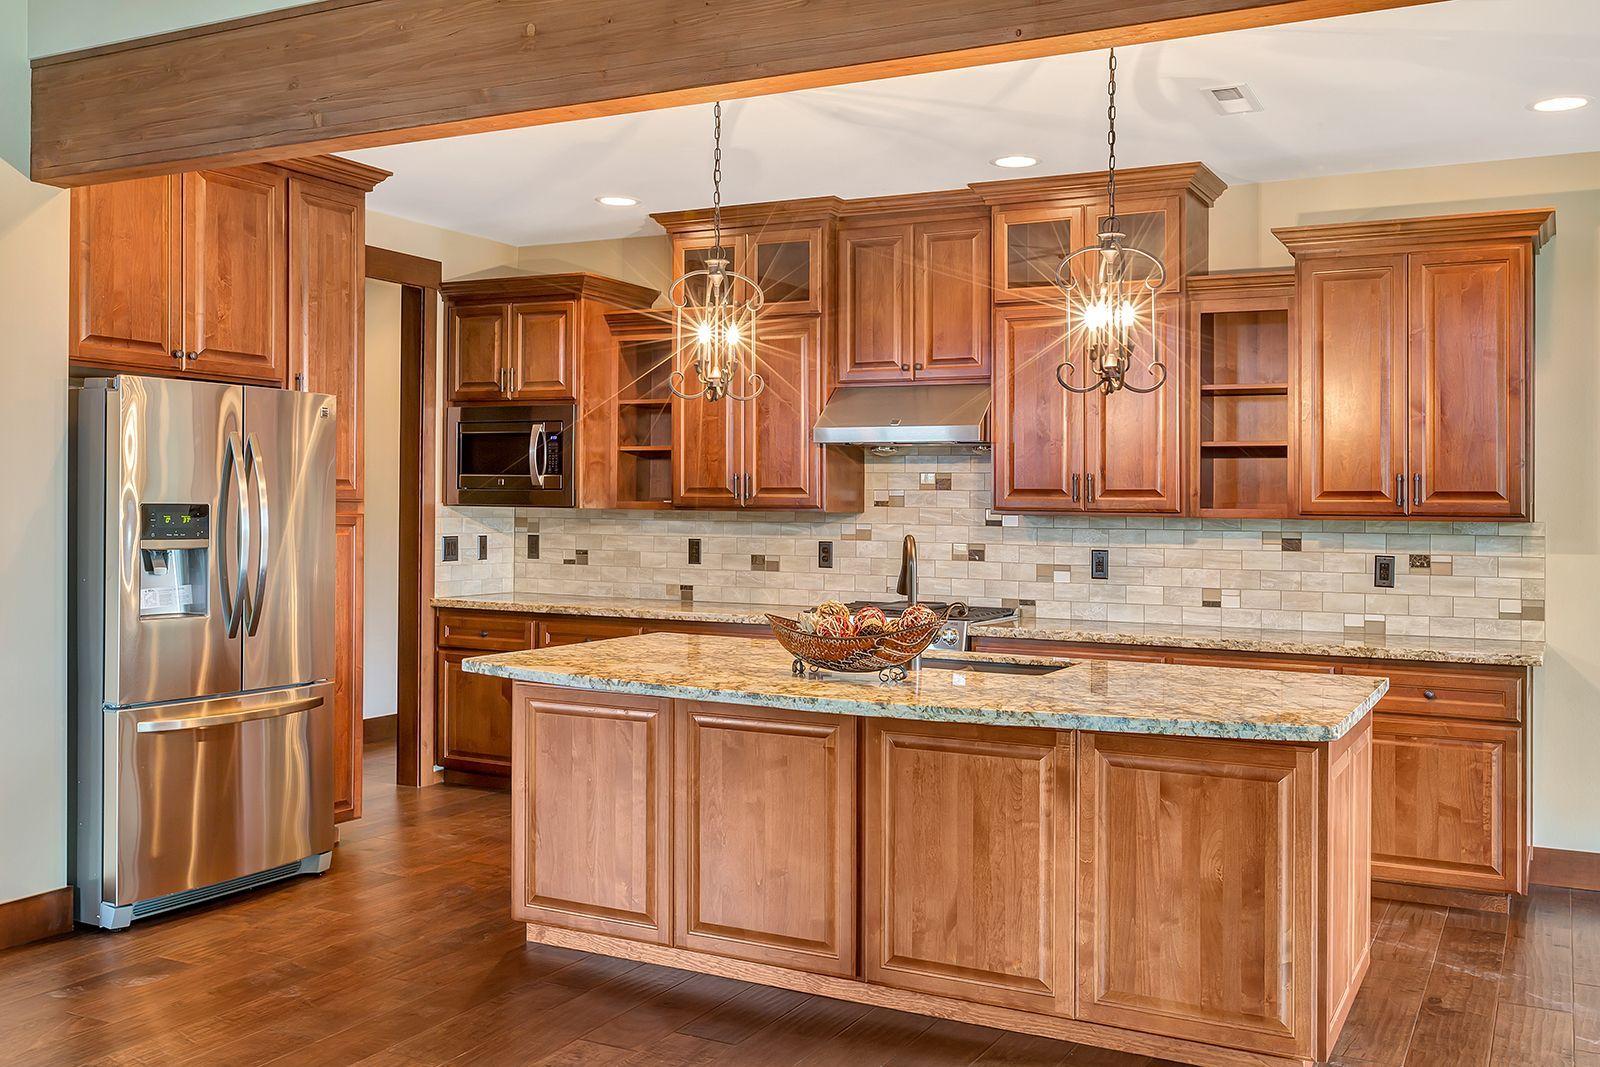 stunning craftsman style kitchen alder cabinets with raised panel rh pinterest com